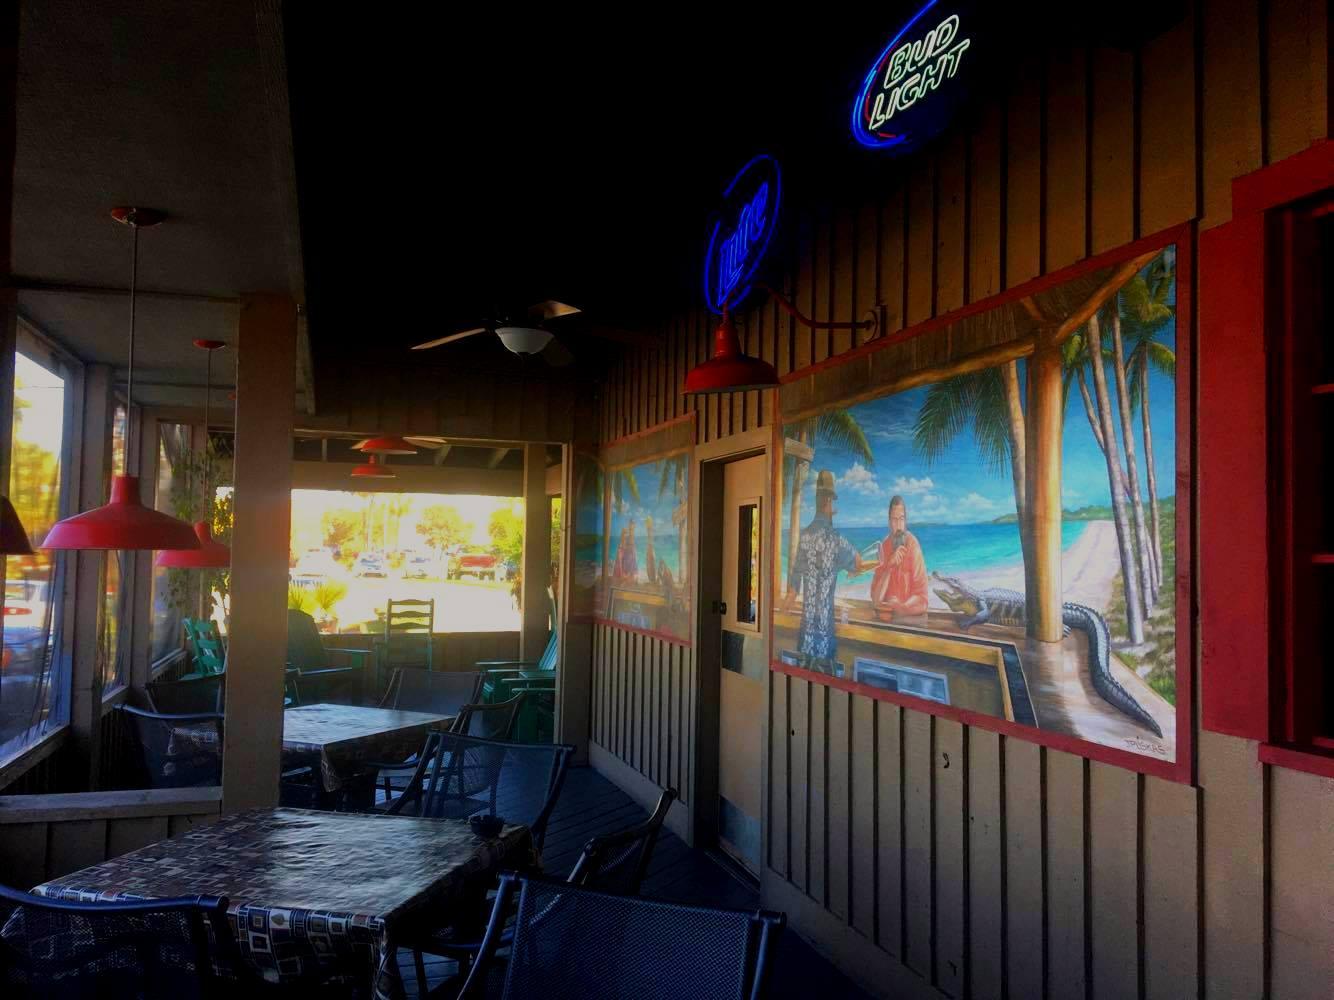 Barbecue Restaurant Jacksonville, FL